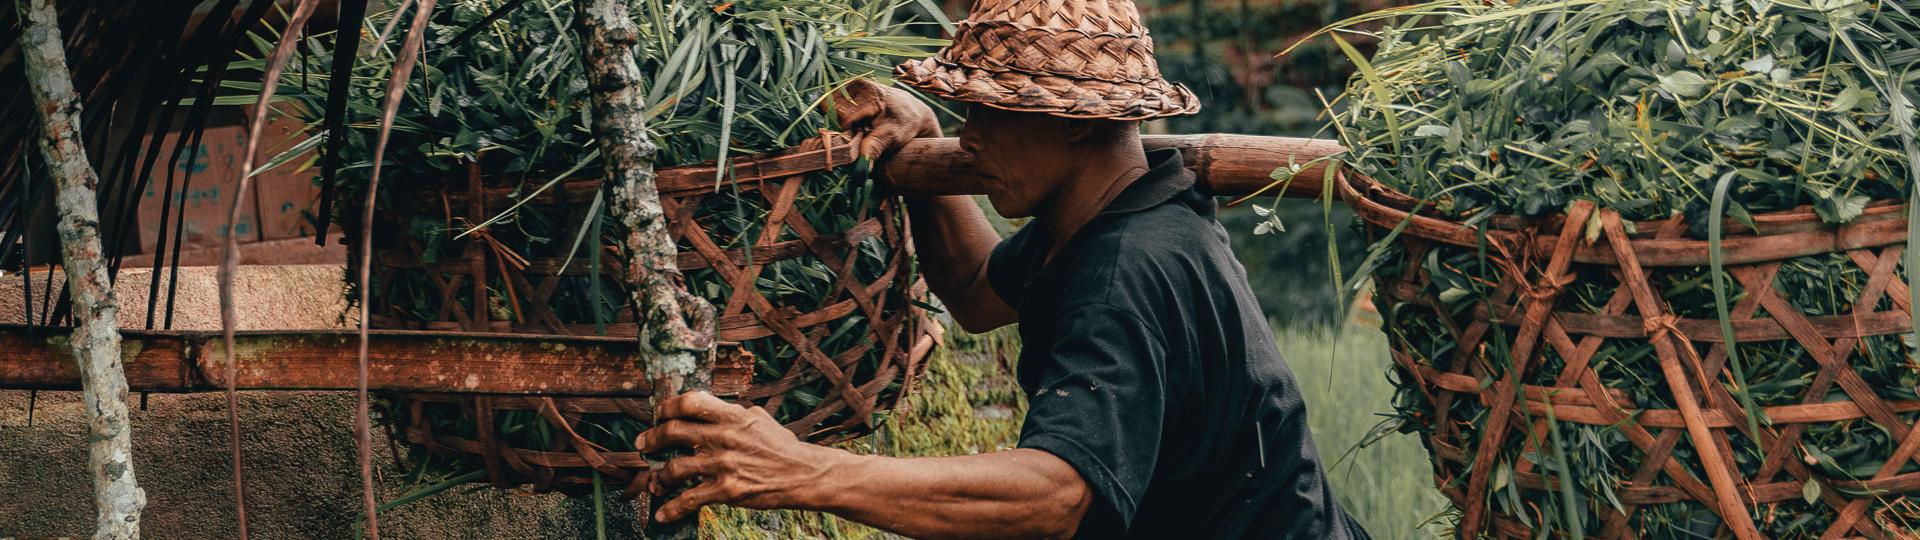 Bali Island Hopper | Topdeck Travel